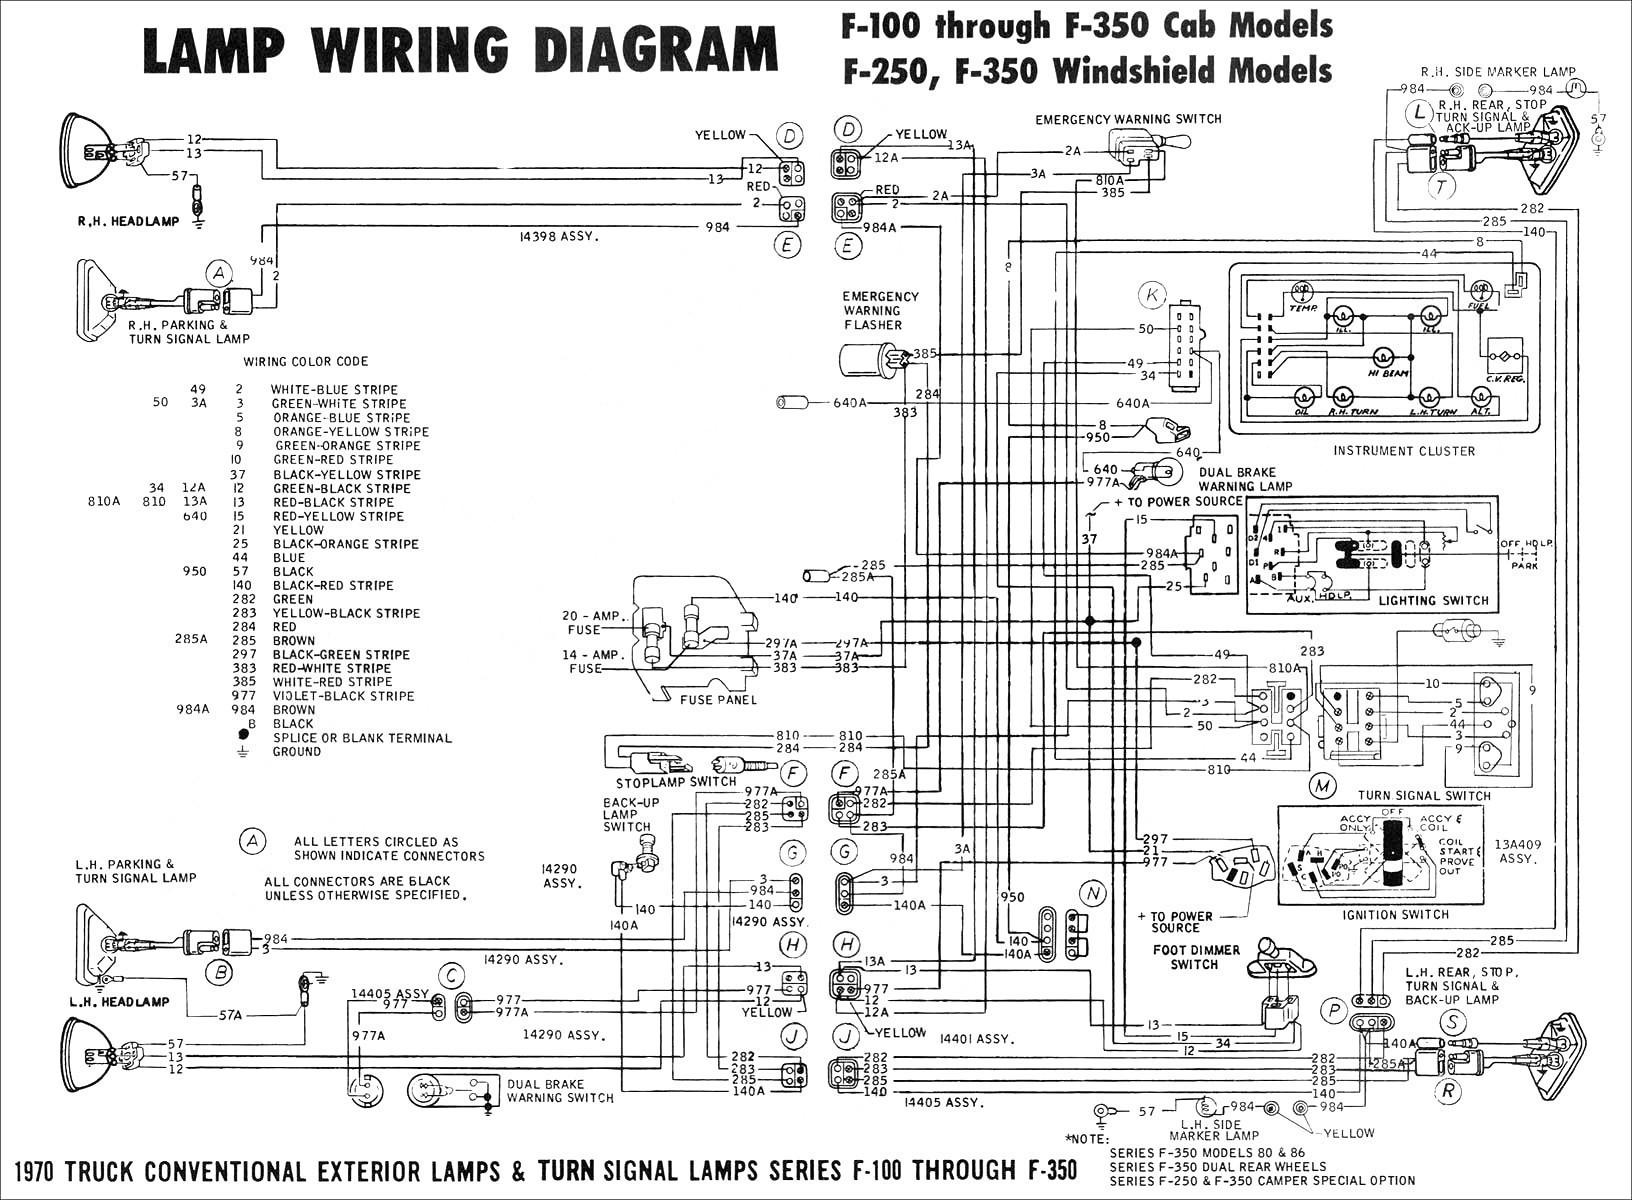 Chrysler Crossfire Engine Diagram 61da 1996 Dodge Dakota Brake Wiring Diagram Of Chrysler Crossfire Engine Diagram